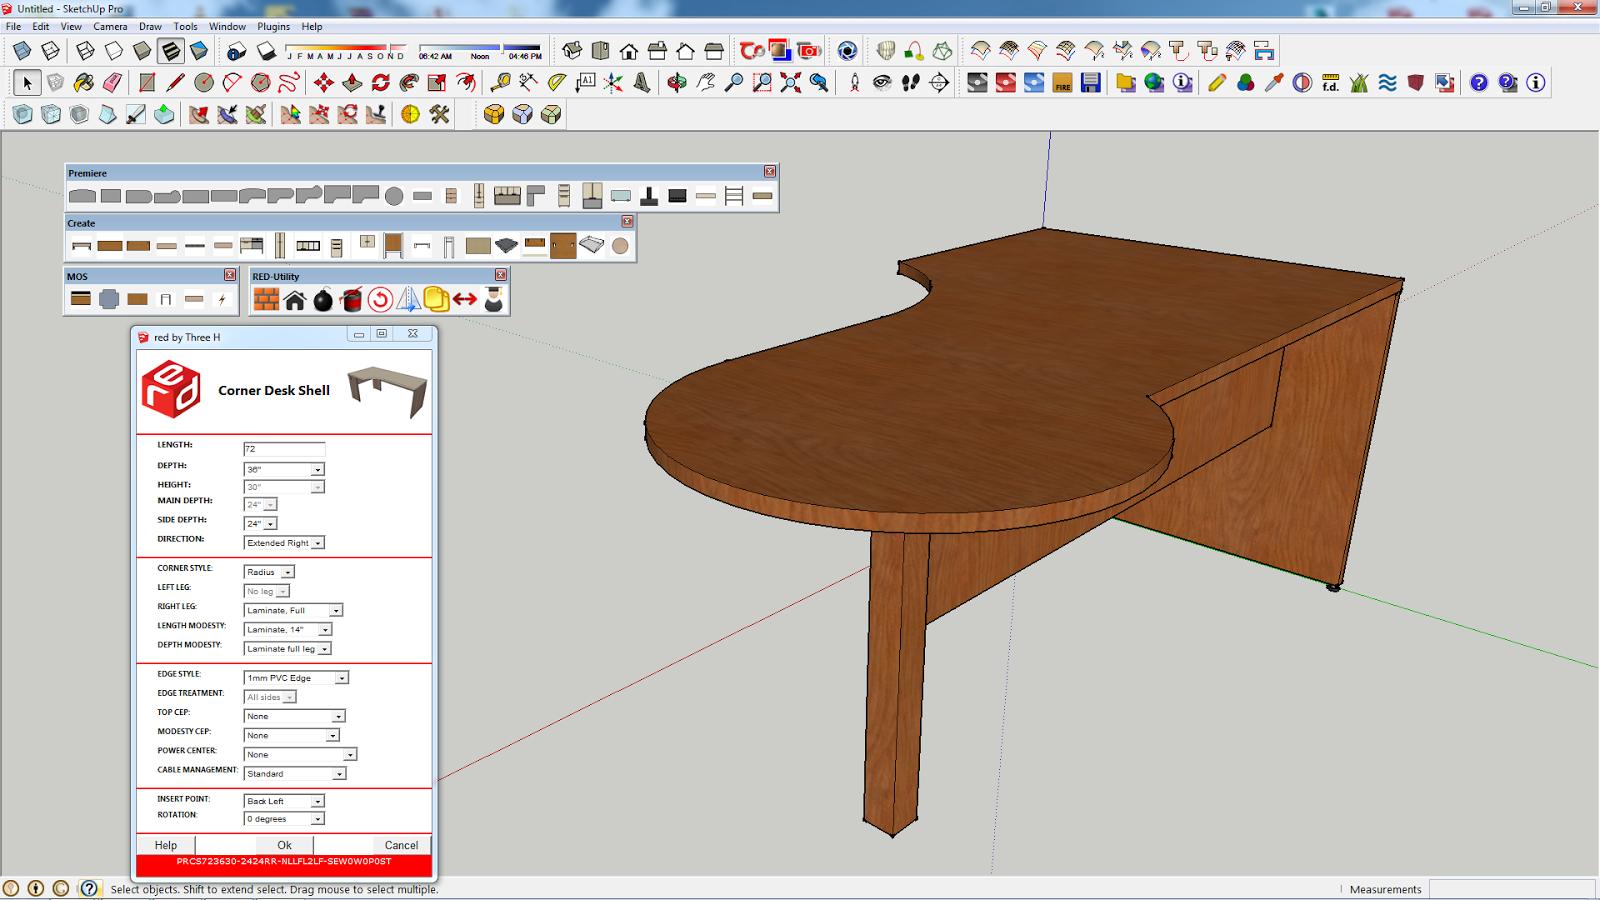 Plugins para dise o 3d red haga muebles de manera f cil y Diseno de interiores 3d data becker windows 7